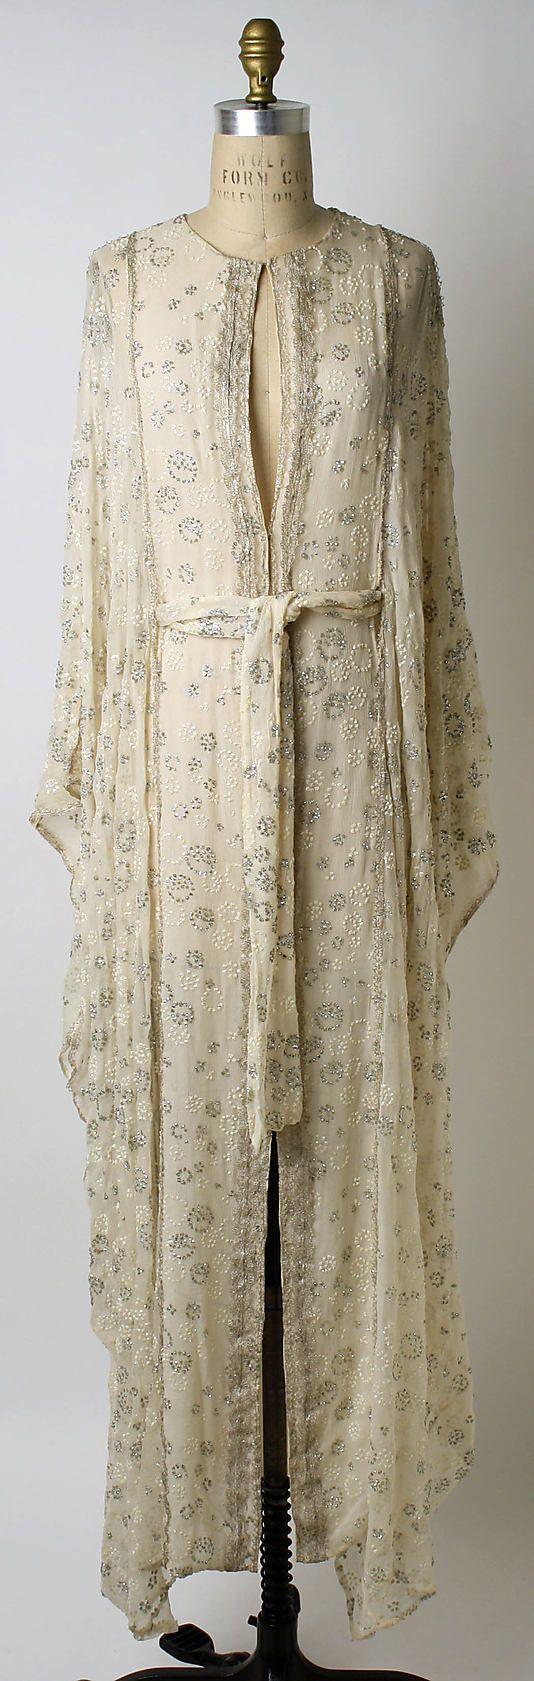 1970s Thea Porter dress